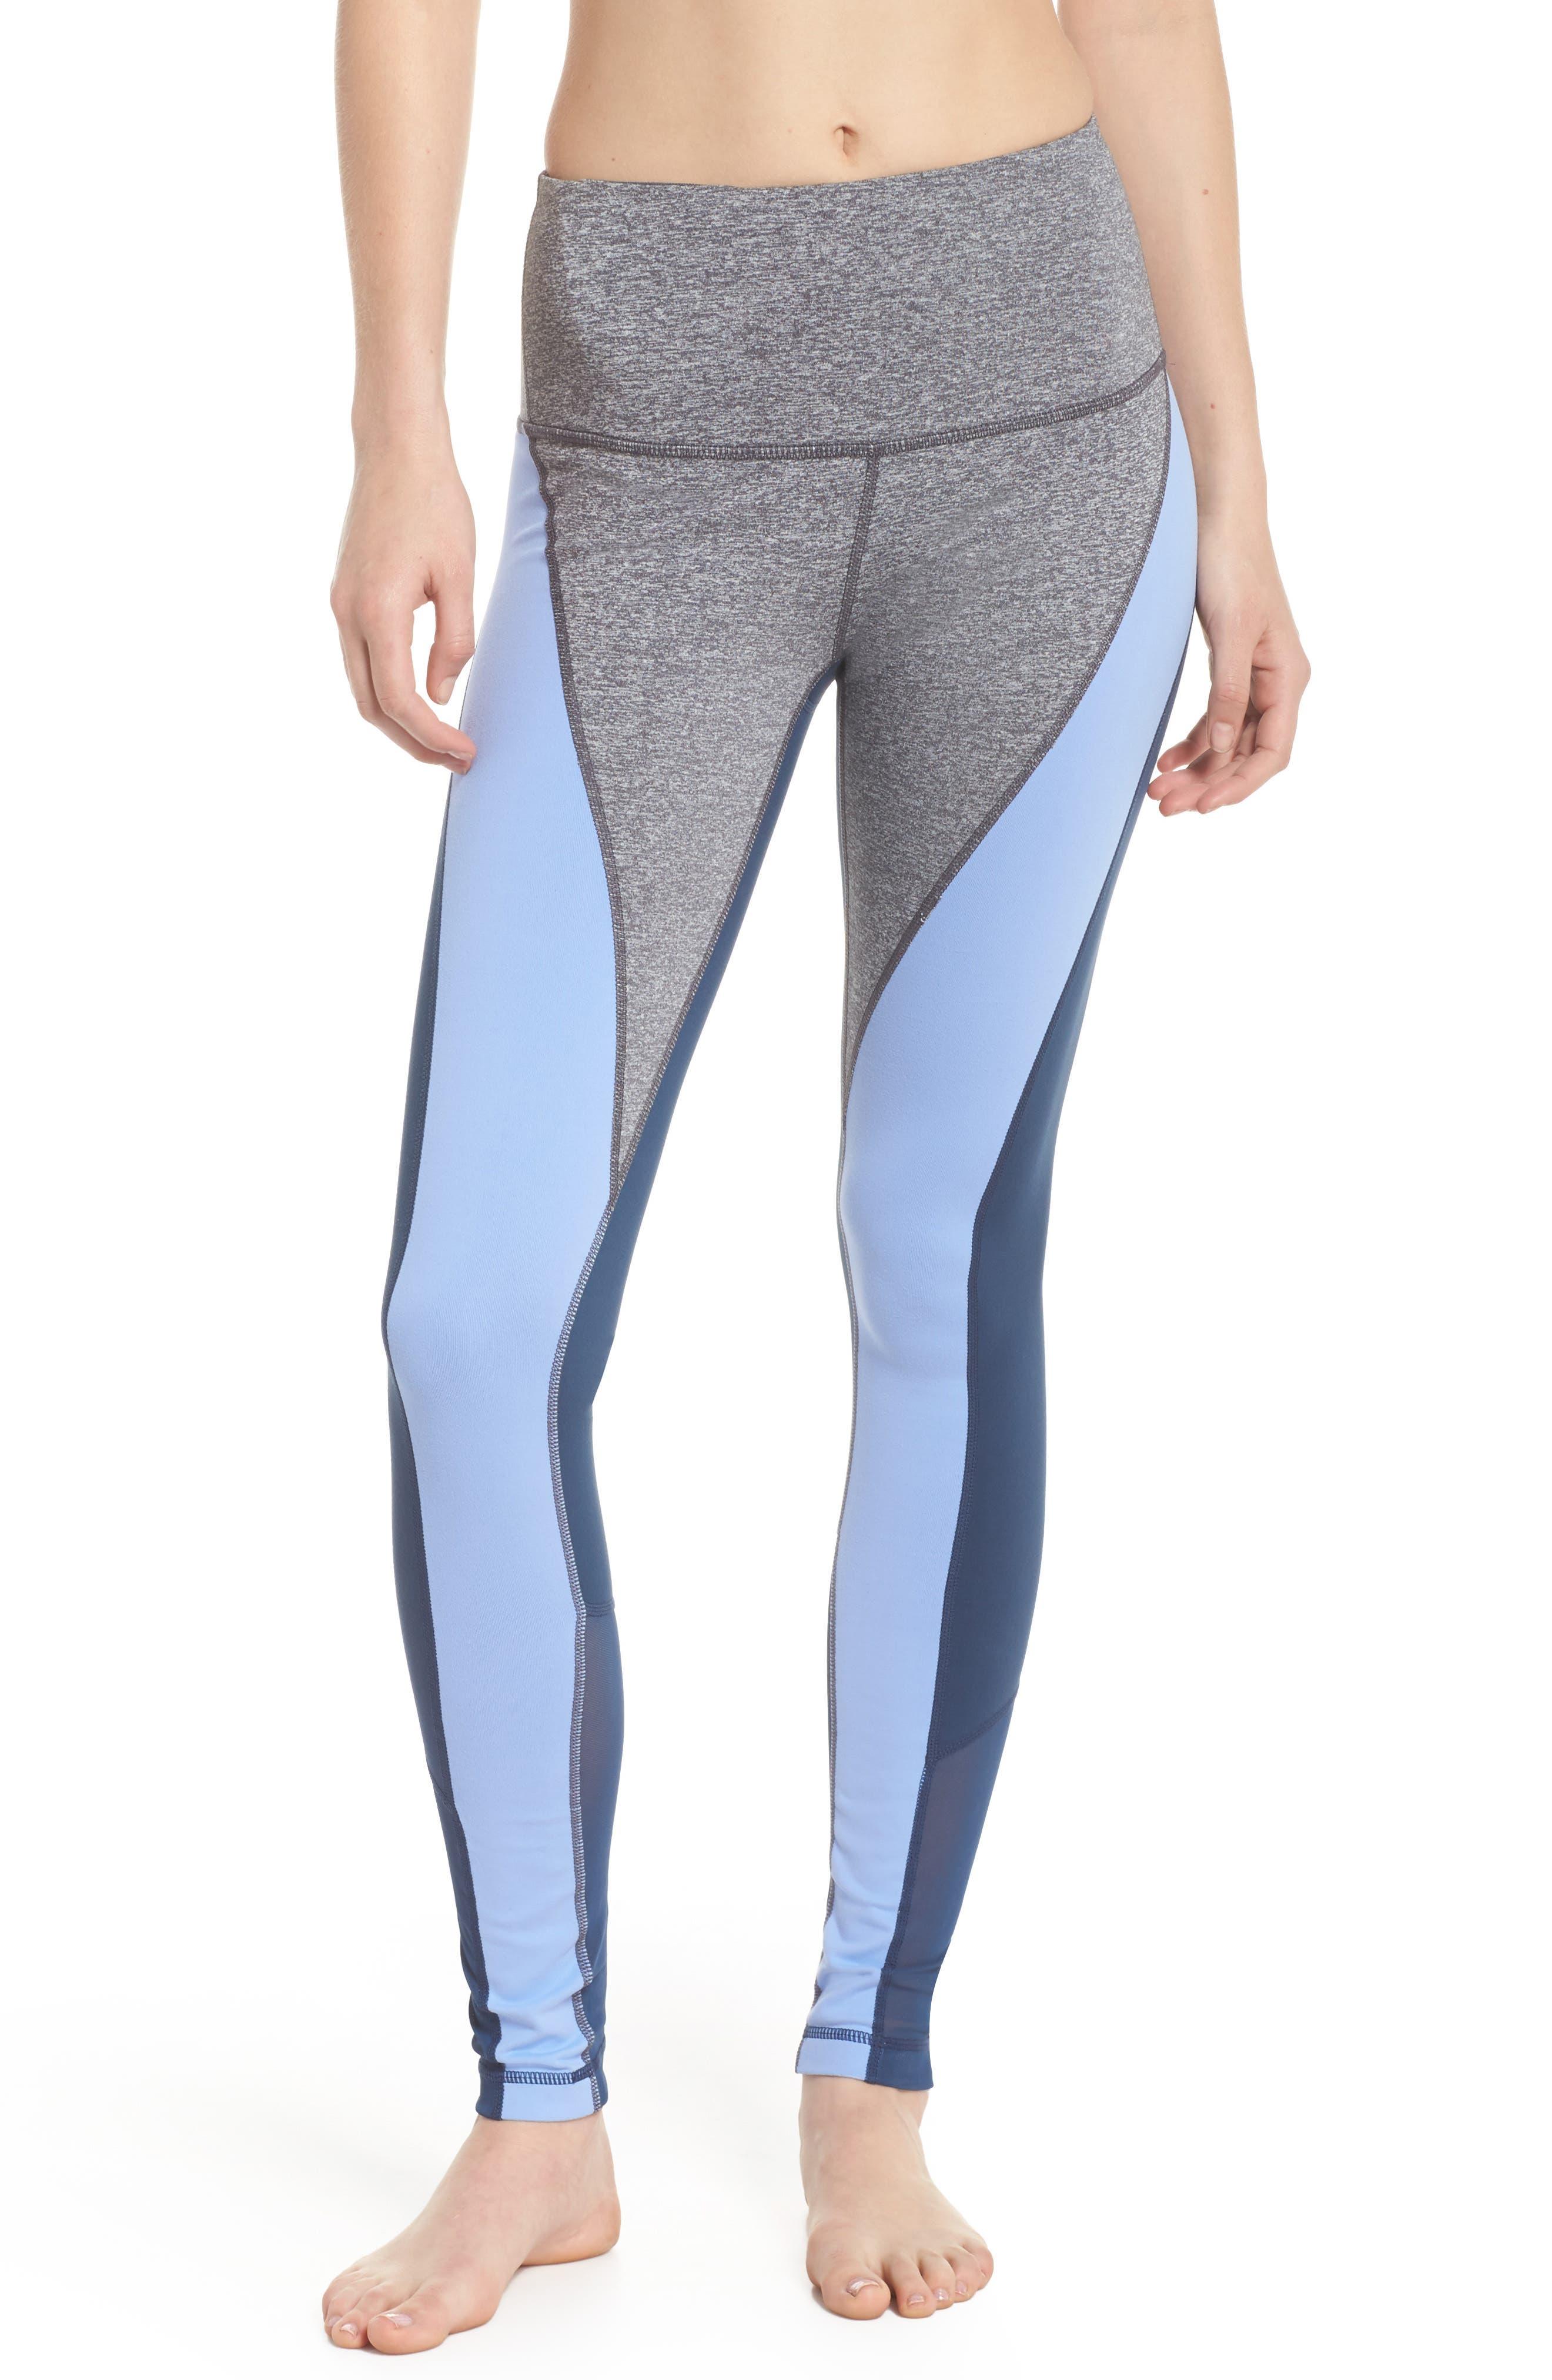 Get in Line High Waist Leggings,                         Main,                         color, Grey Graphite Melange